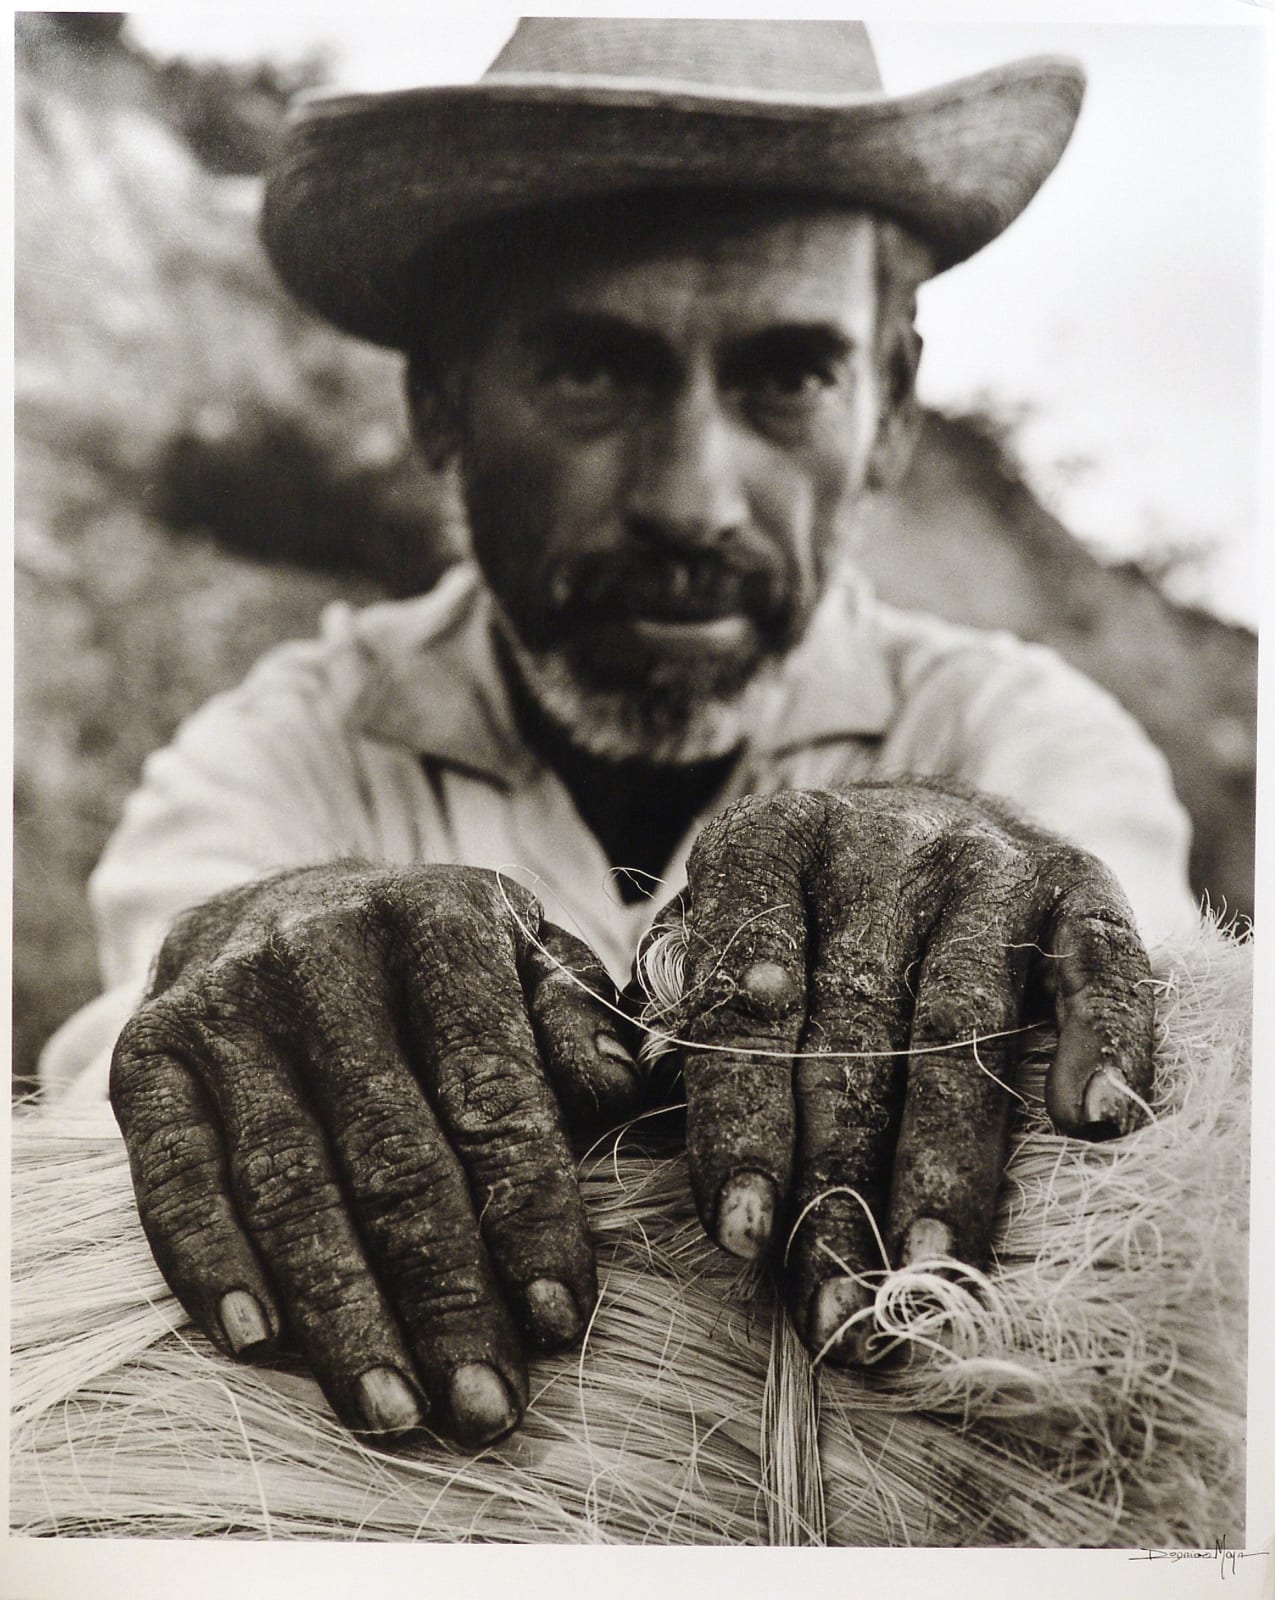 Rodrigo Moya - La vida no es bella, Coahuila, México, 1965